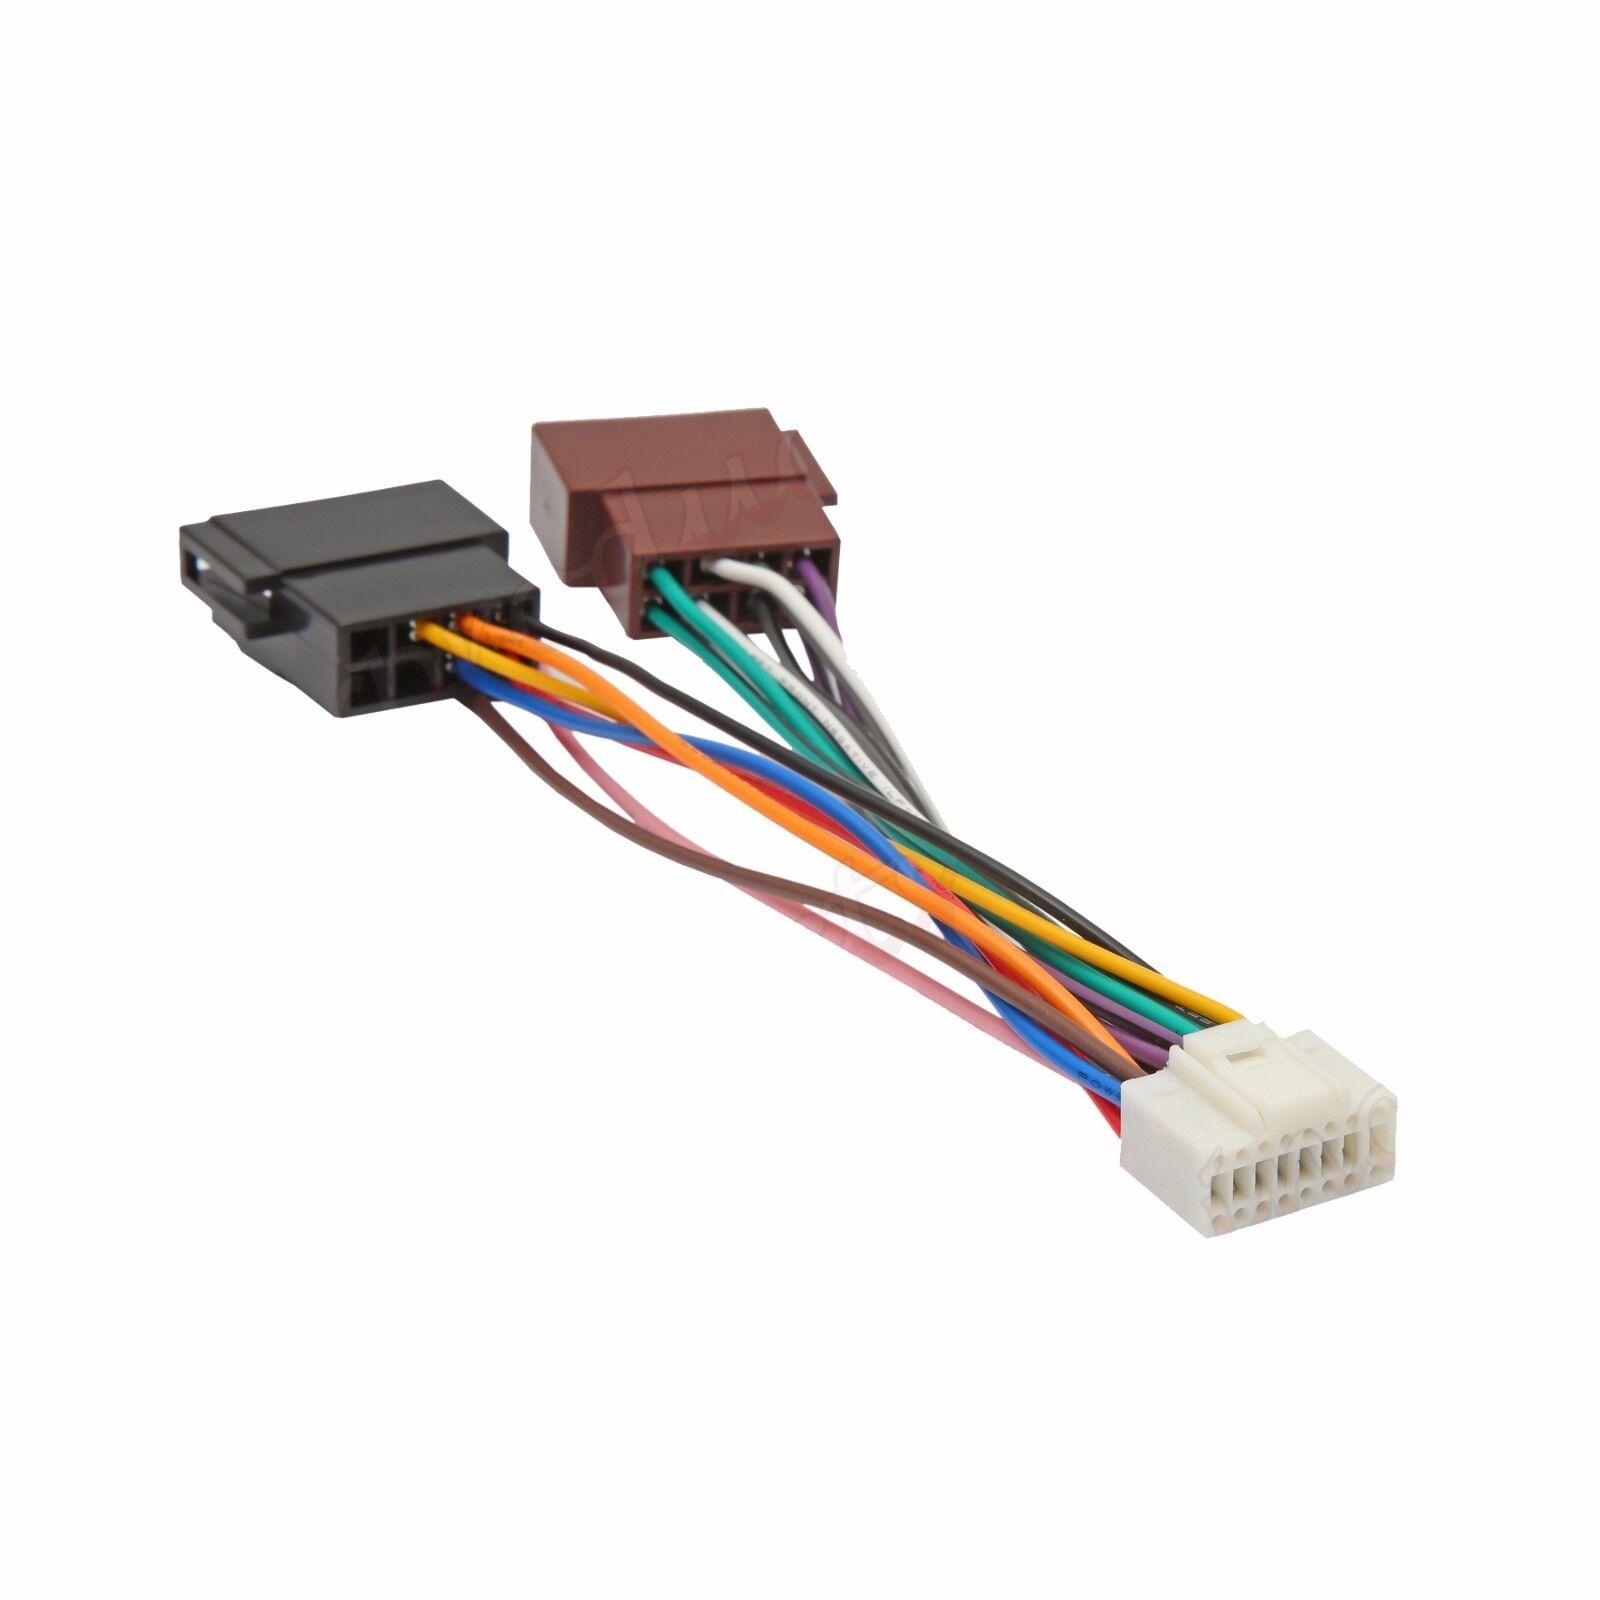 medium resolution of alpine 16 pin iso wiring harness connector adaptor car stereo radio loom